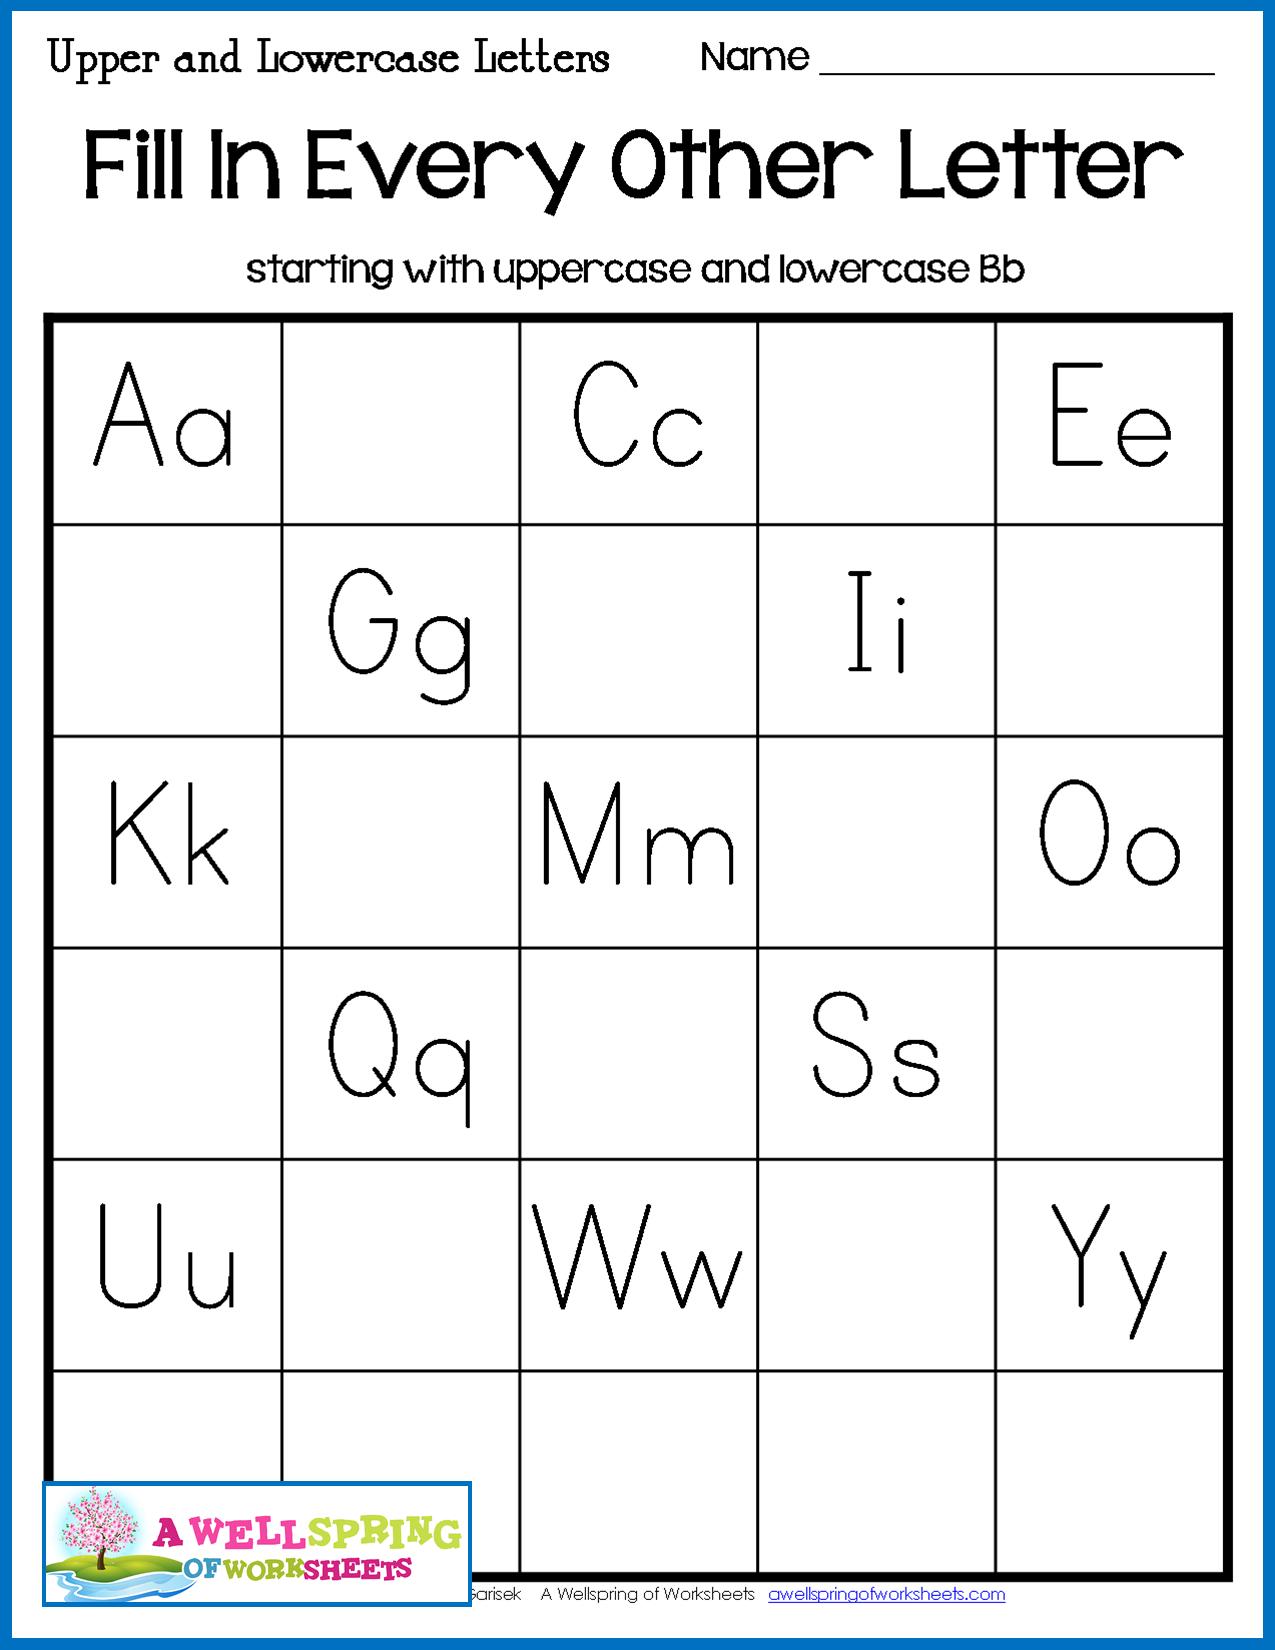 Missing Letters Worksheets | English Worksheets For Kids throughout Alphabet Worksheets Missing Letters